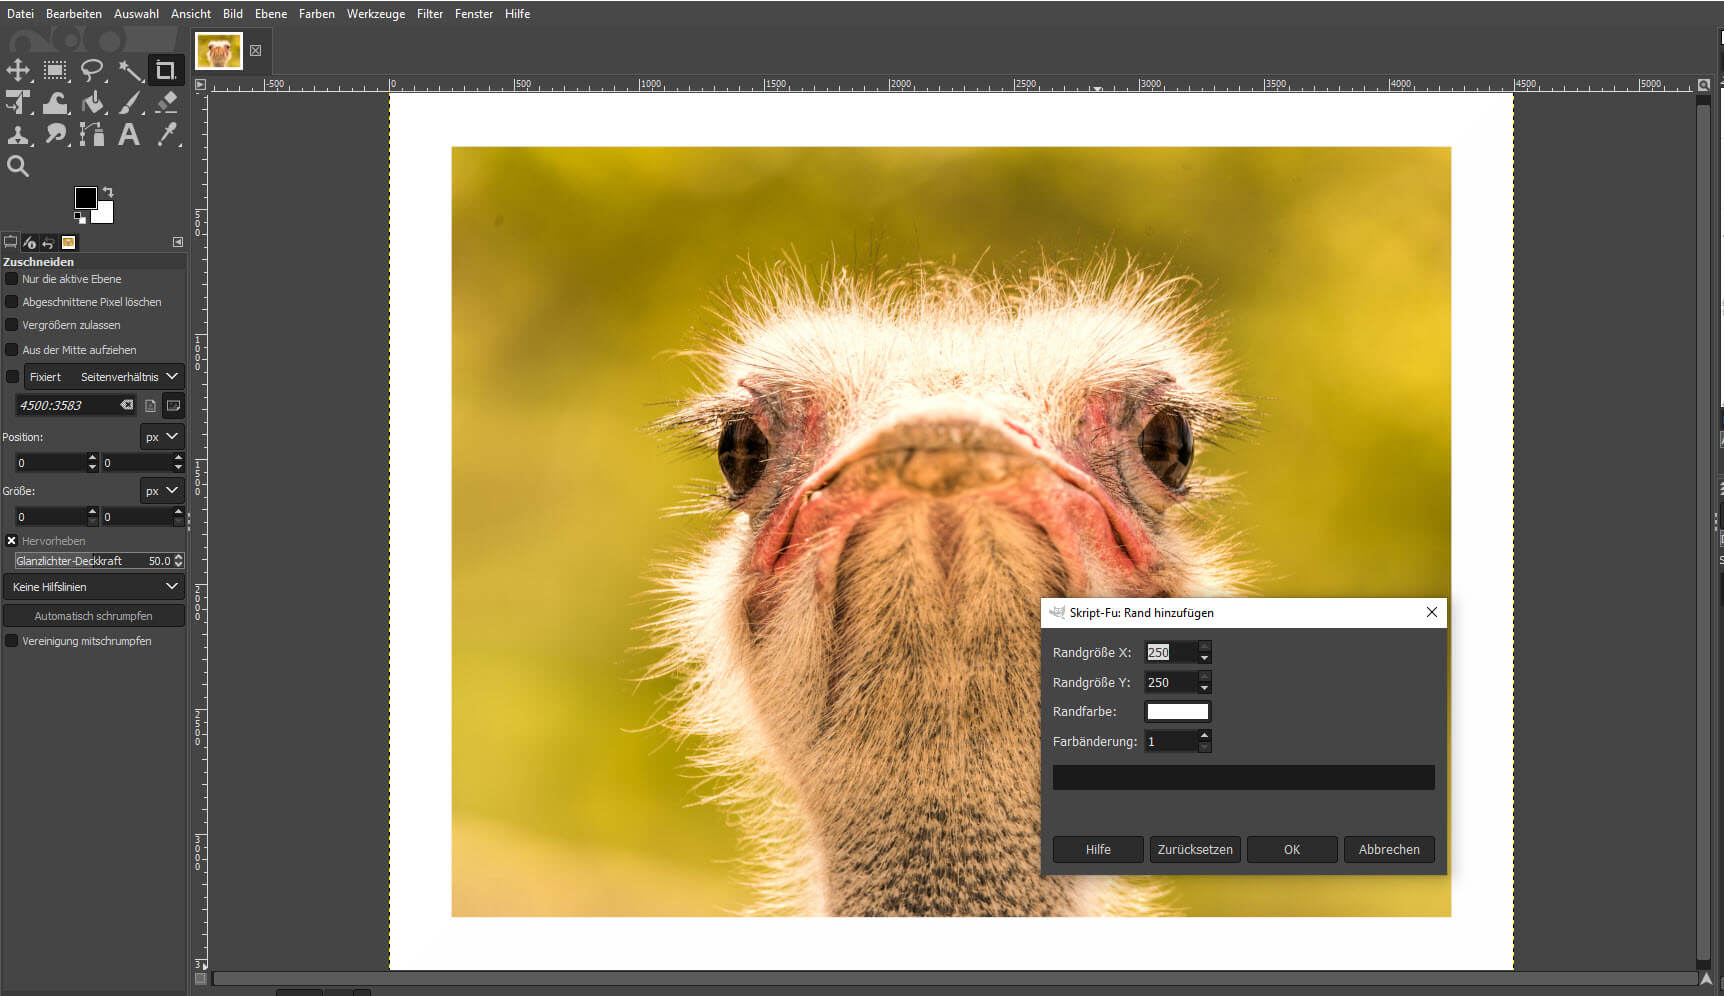 Rahmen um Bild erstellen in GIMP